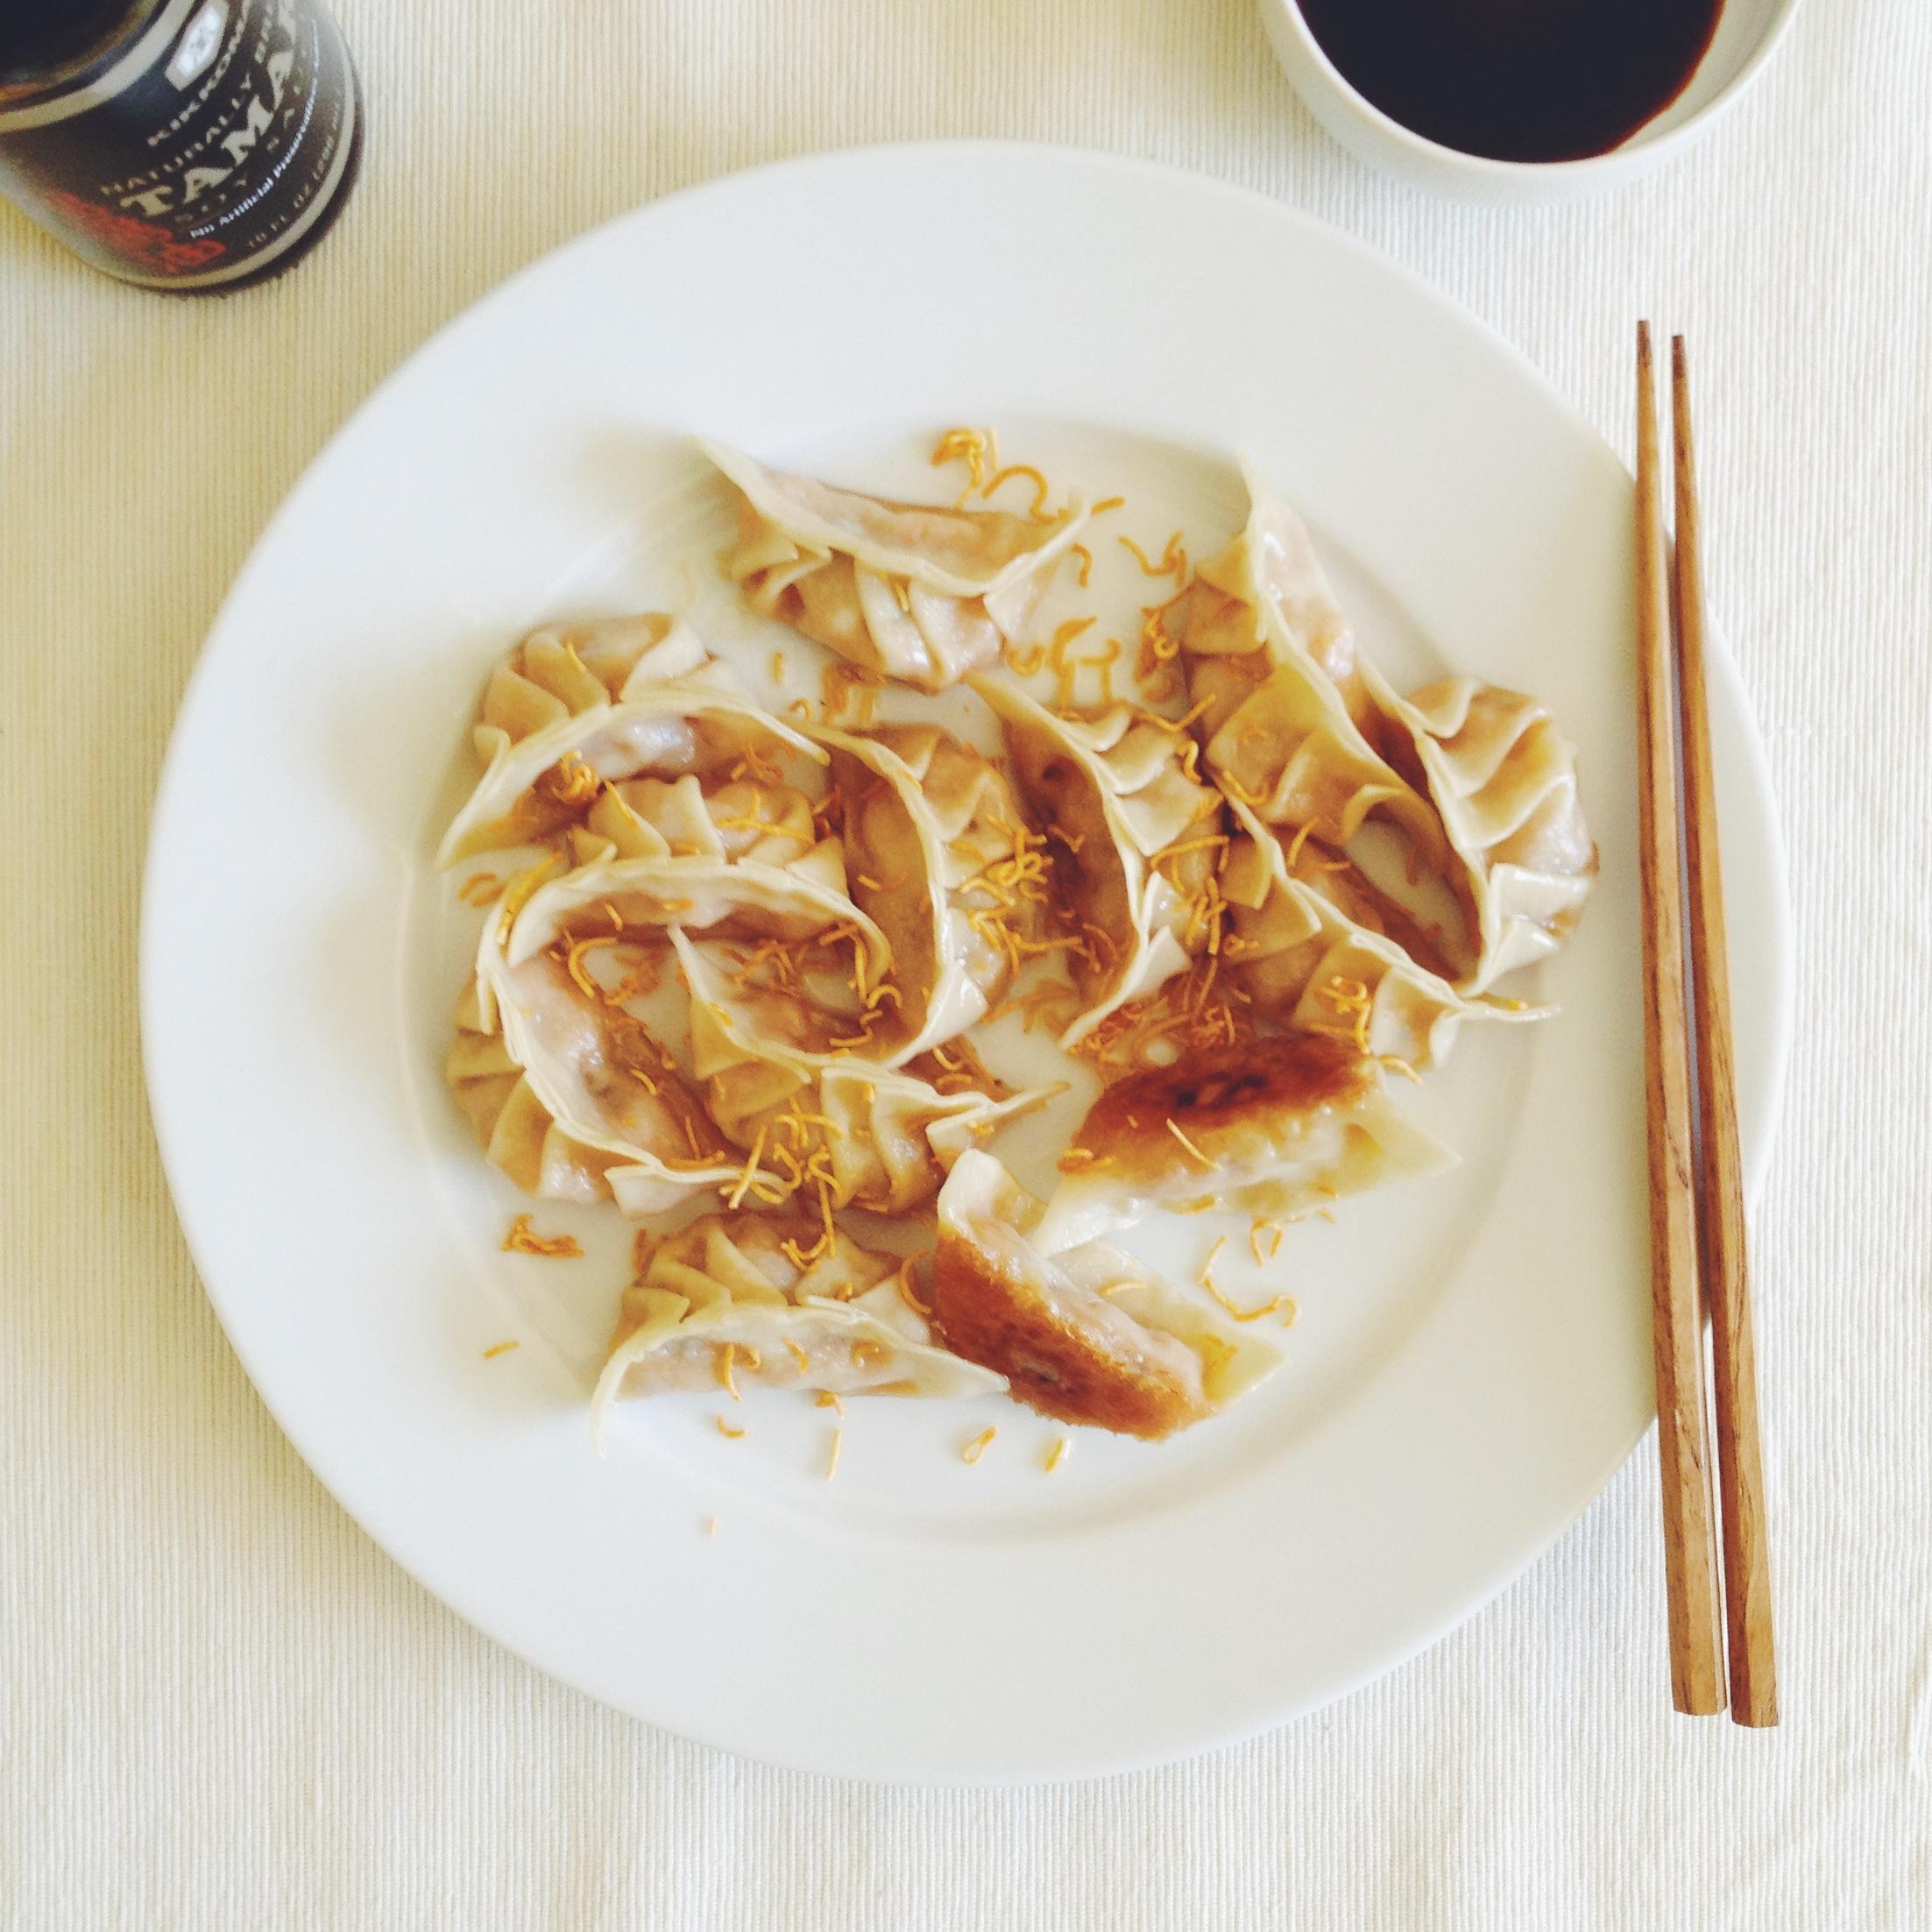 Tangra Dumplings | Chinese-Indian Pop-Up Dinner